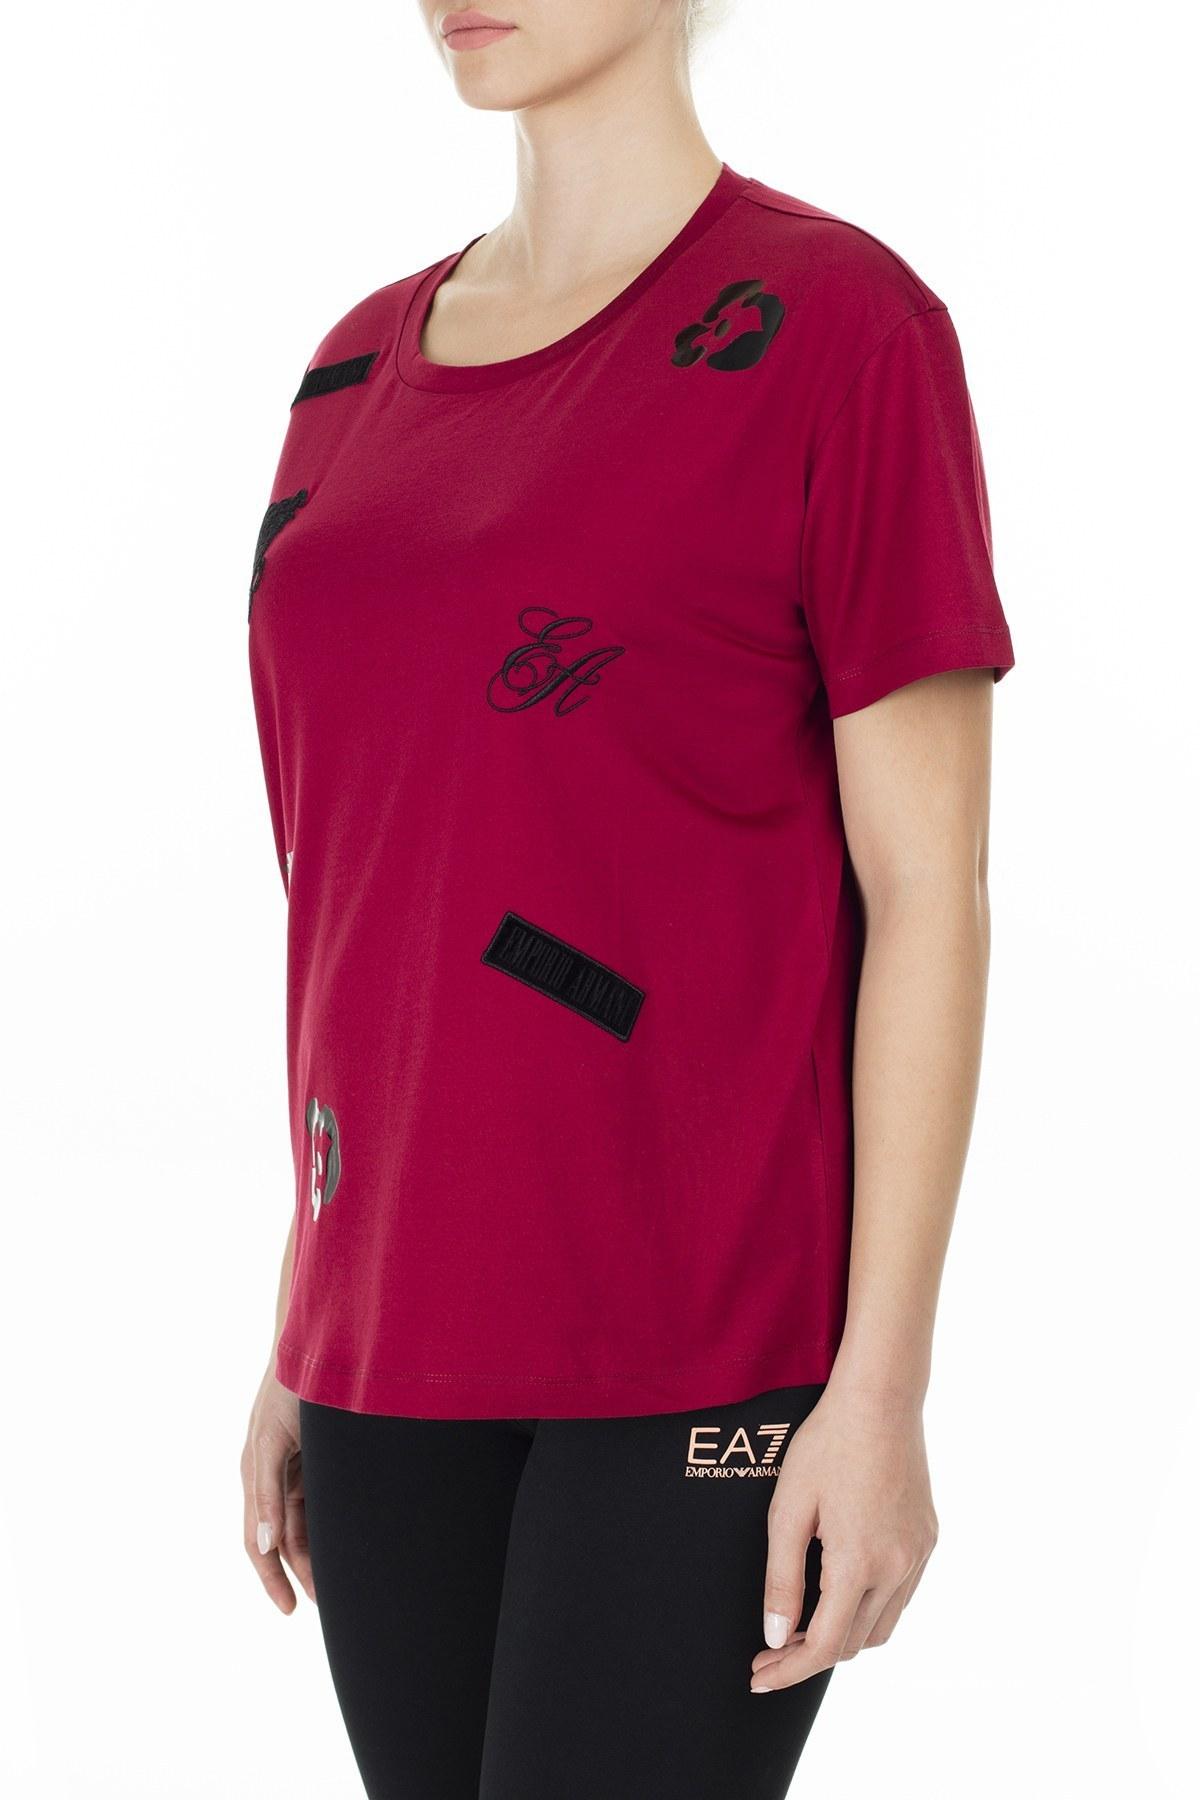 Emporio Armani Kadın T Shirt 6G2T7M 2J95Z 0340 BORDO